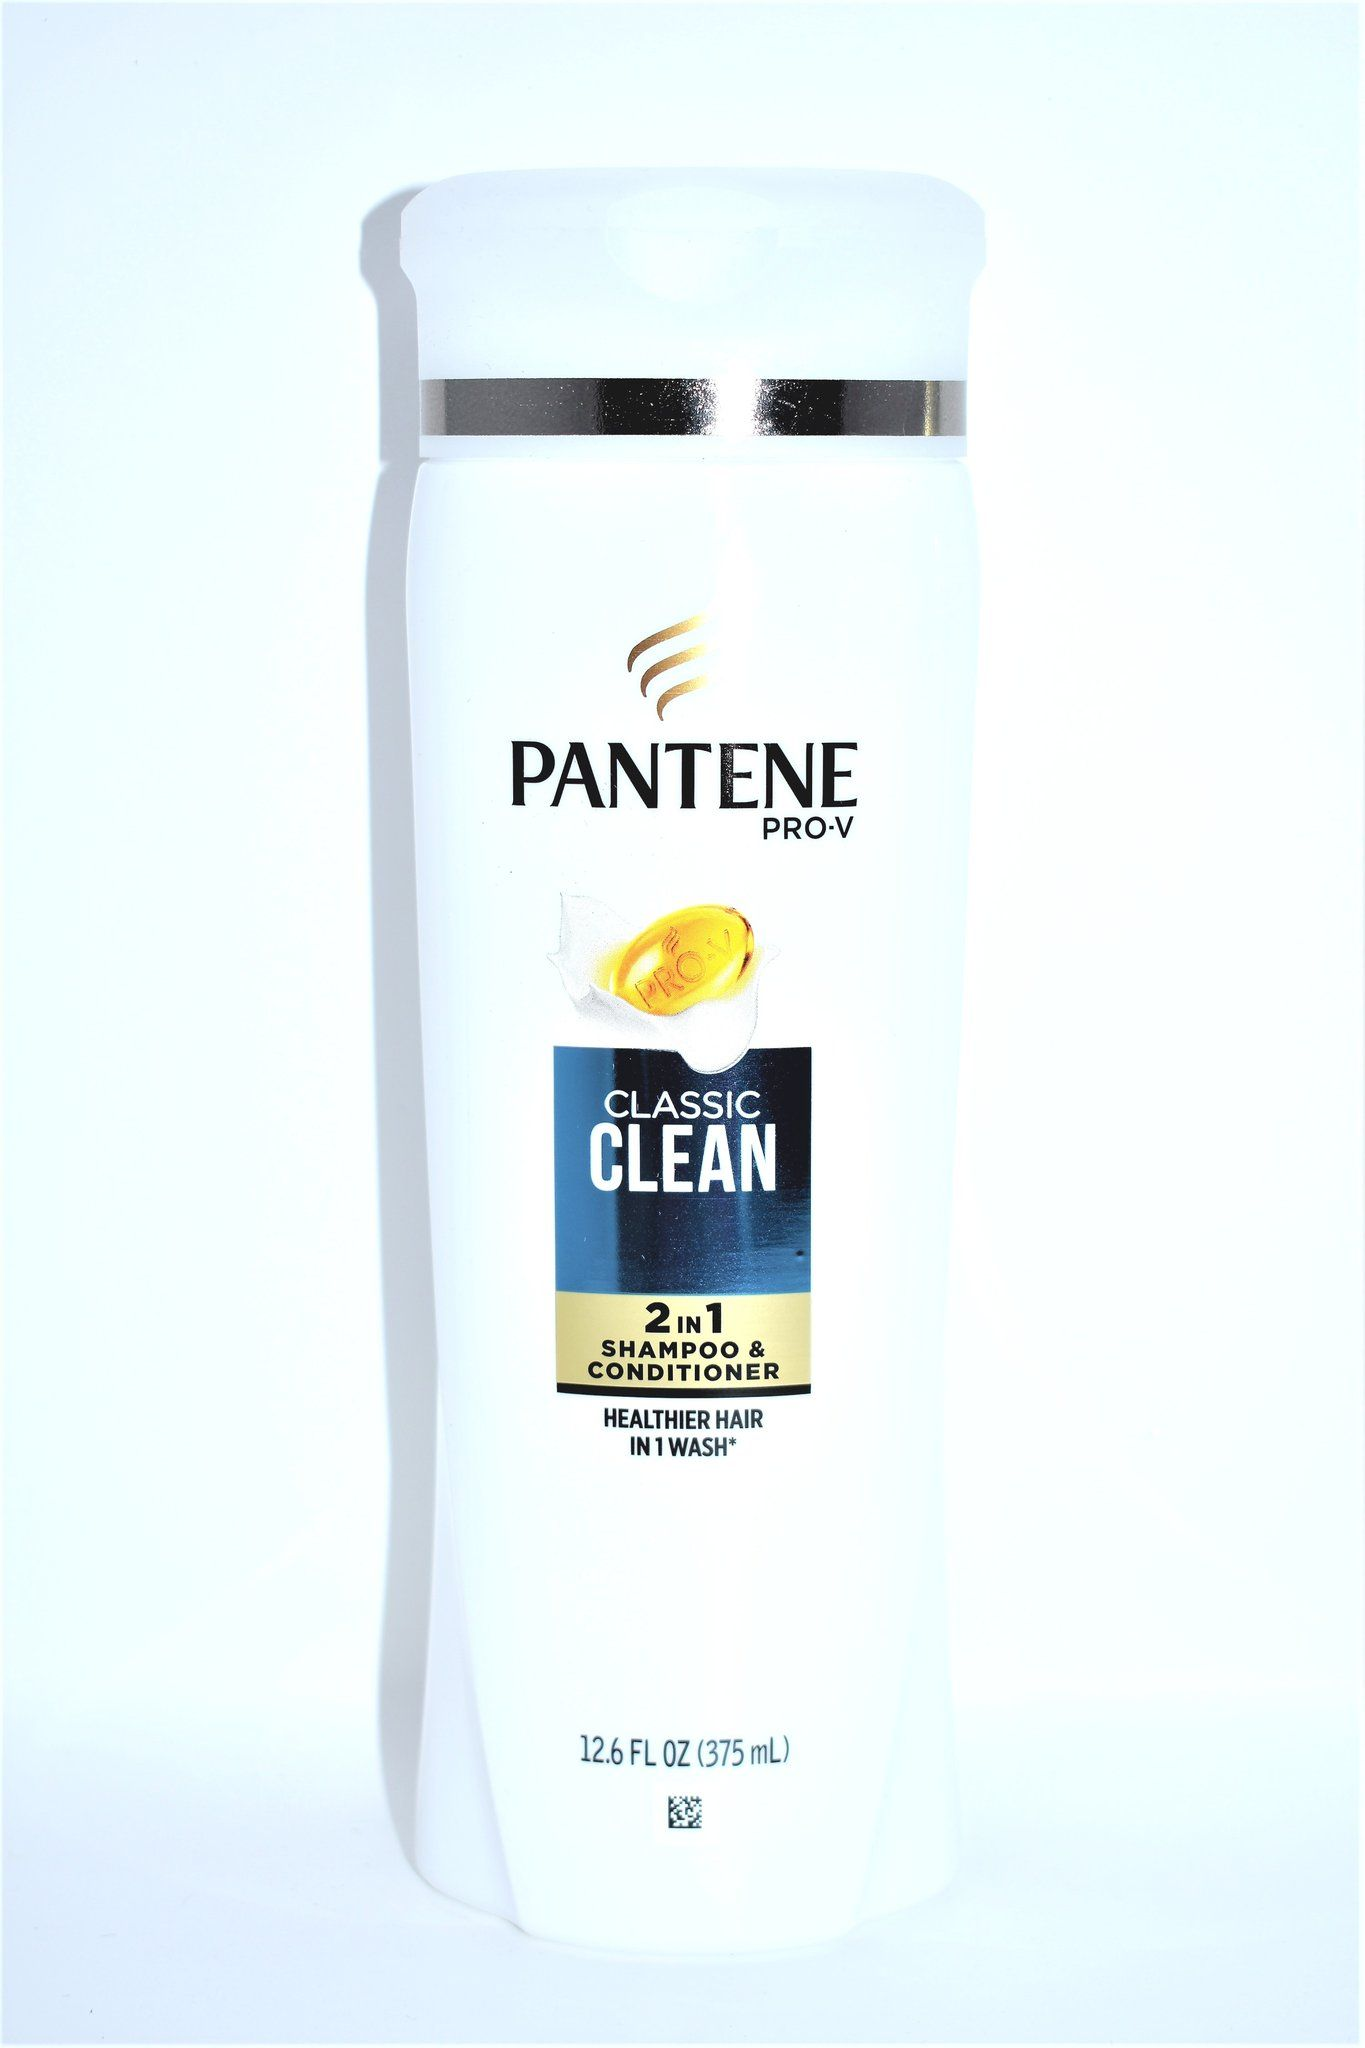 Pantene Pro V Classic Clean 2 In 1 Shampoo Conditioner 12 6 Fl